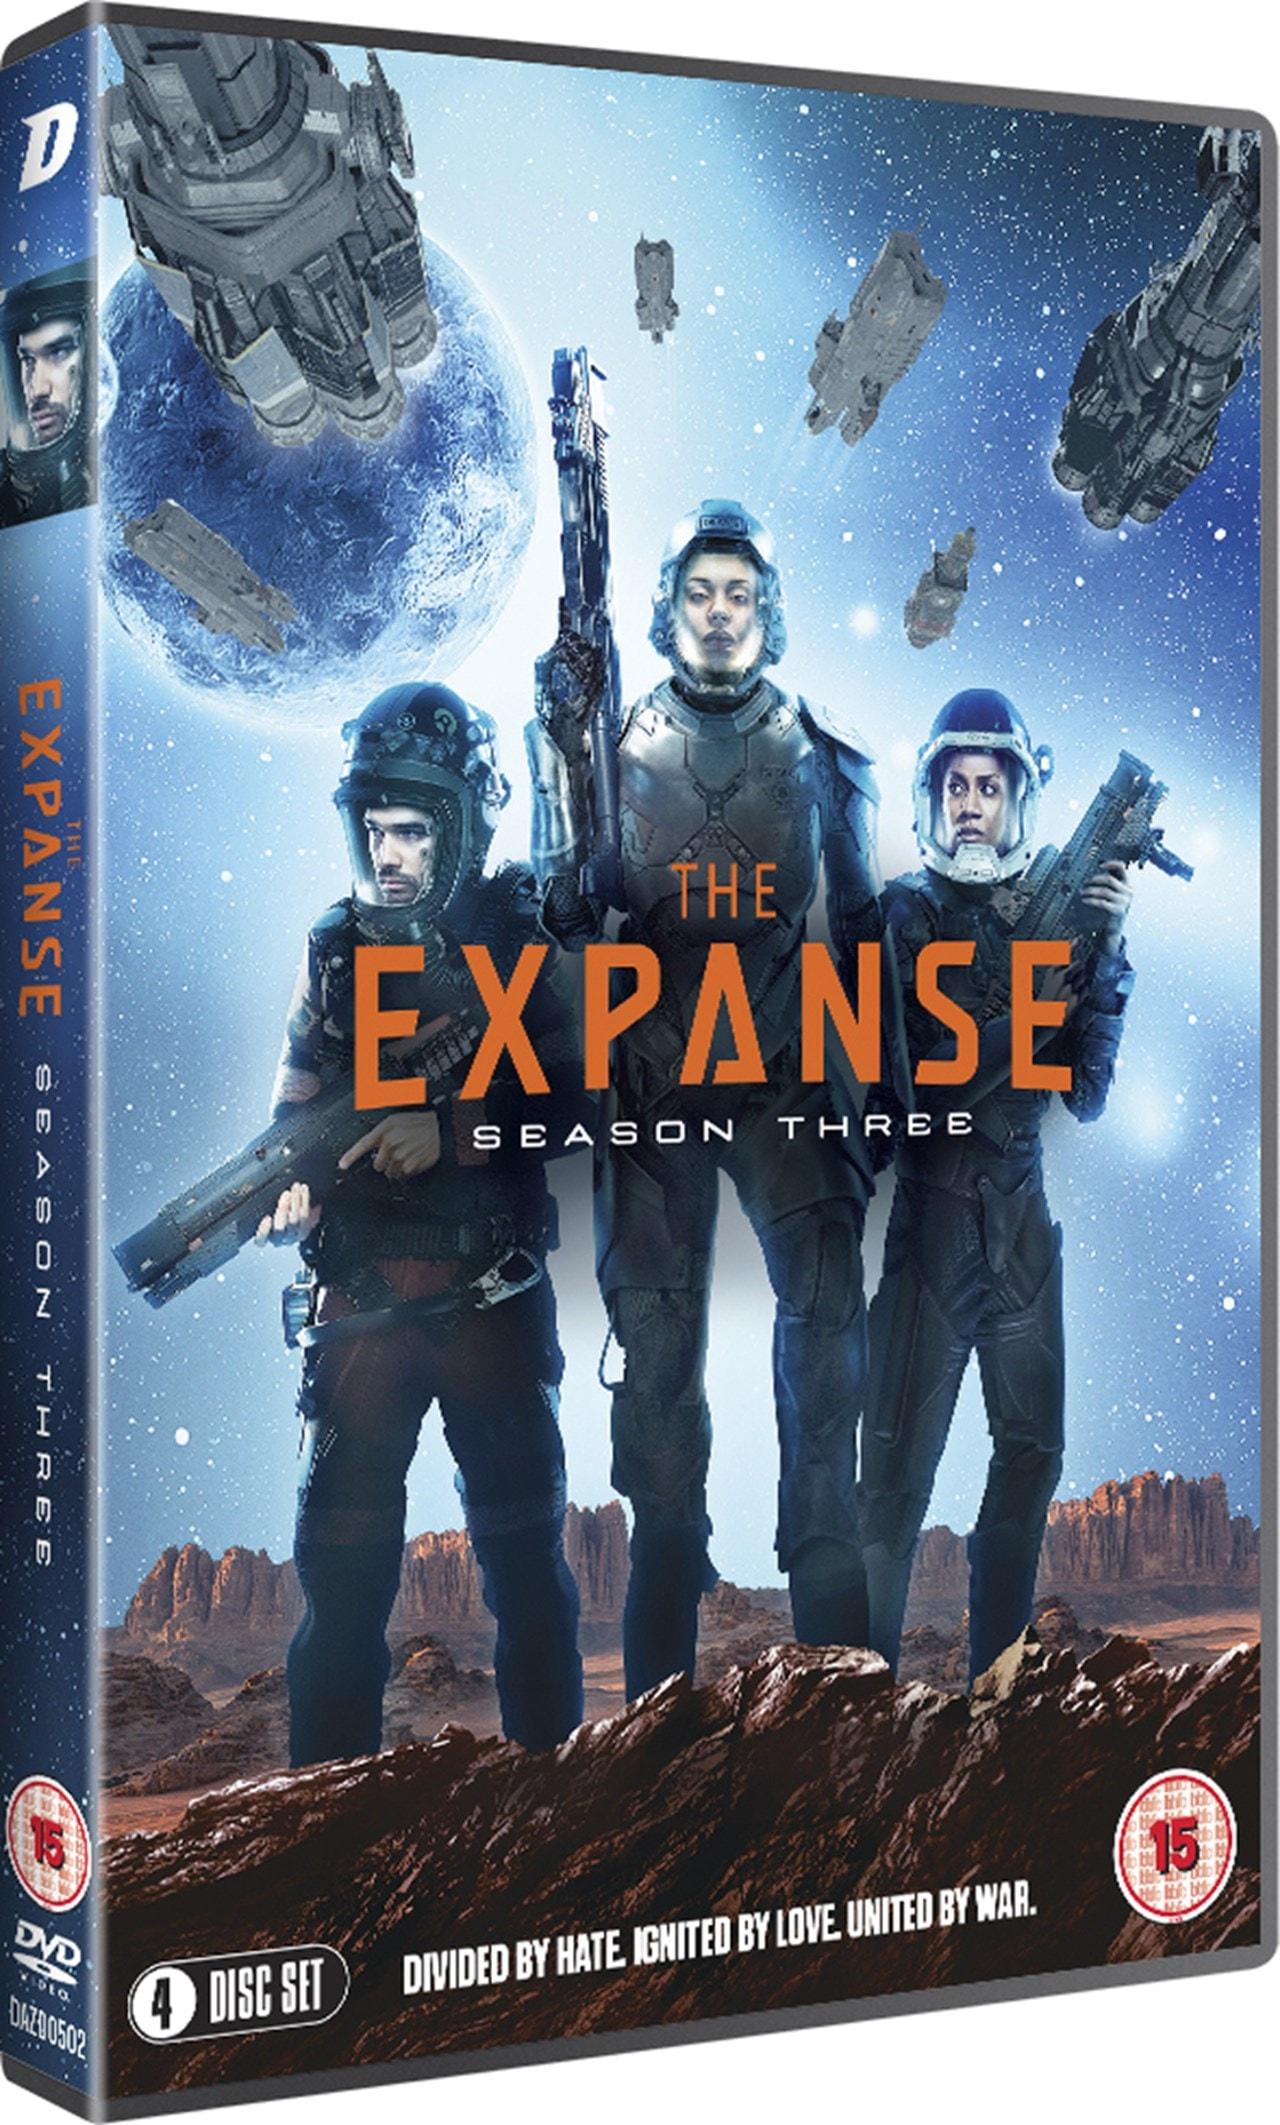 The Expanse: Season Three - 2